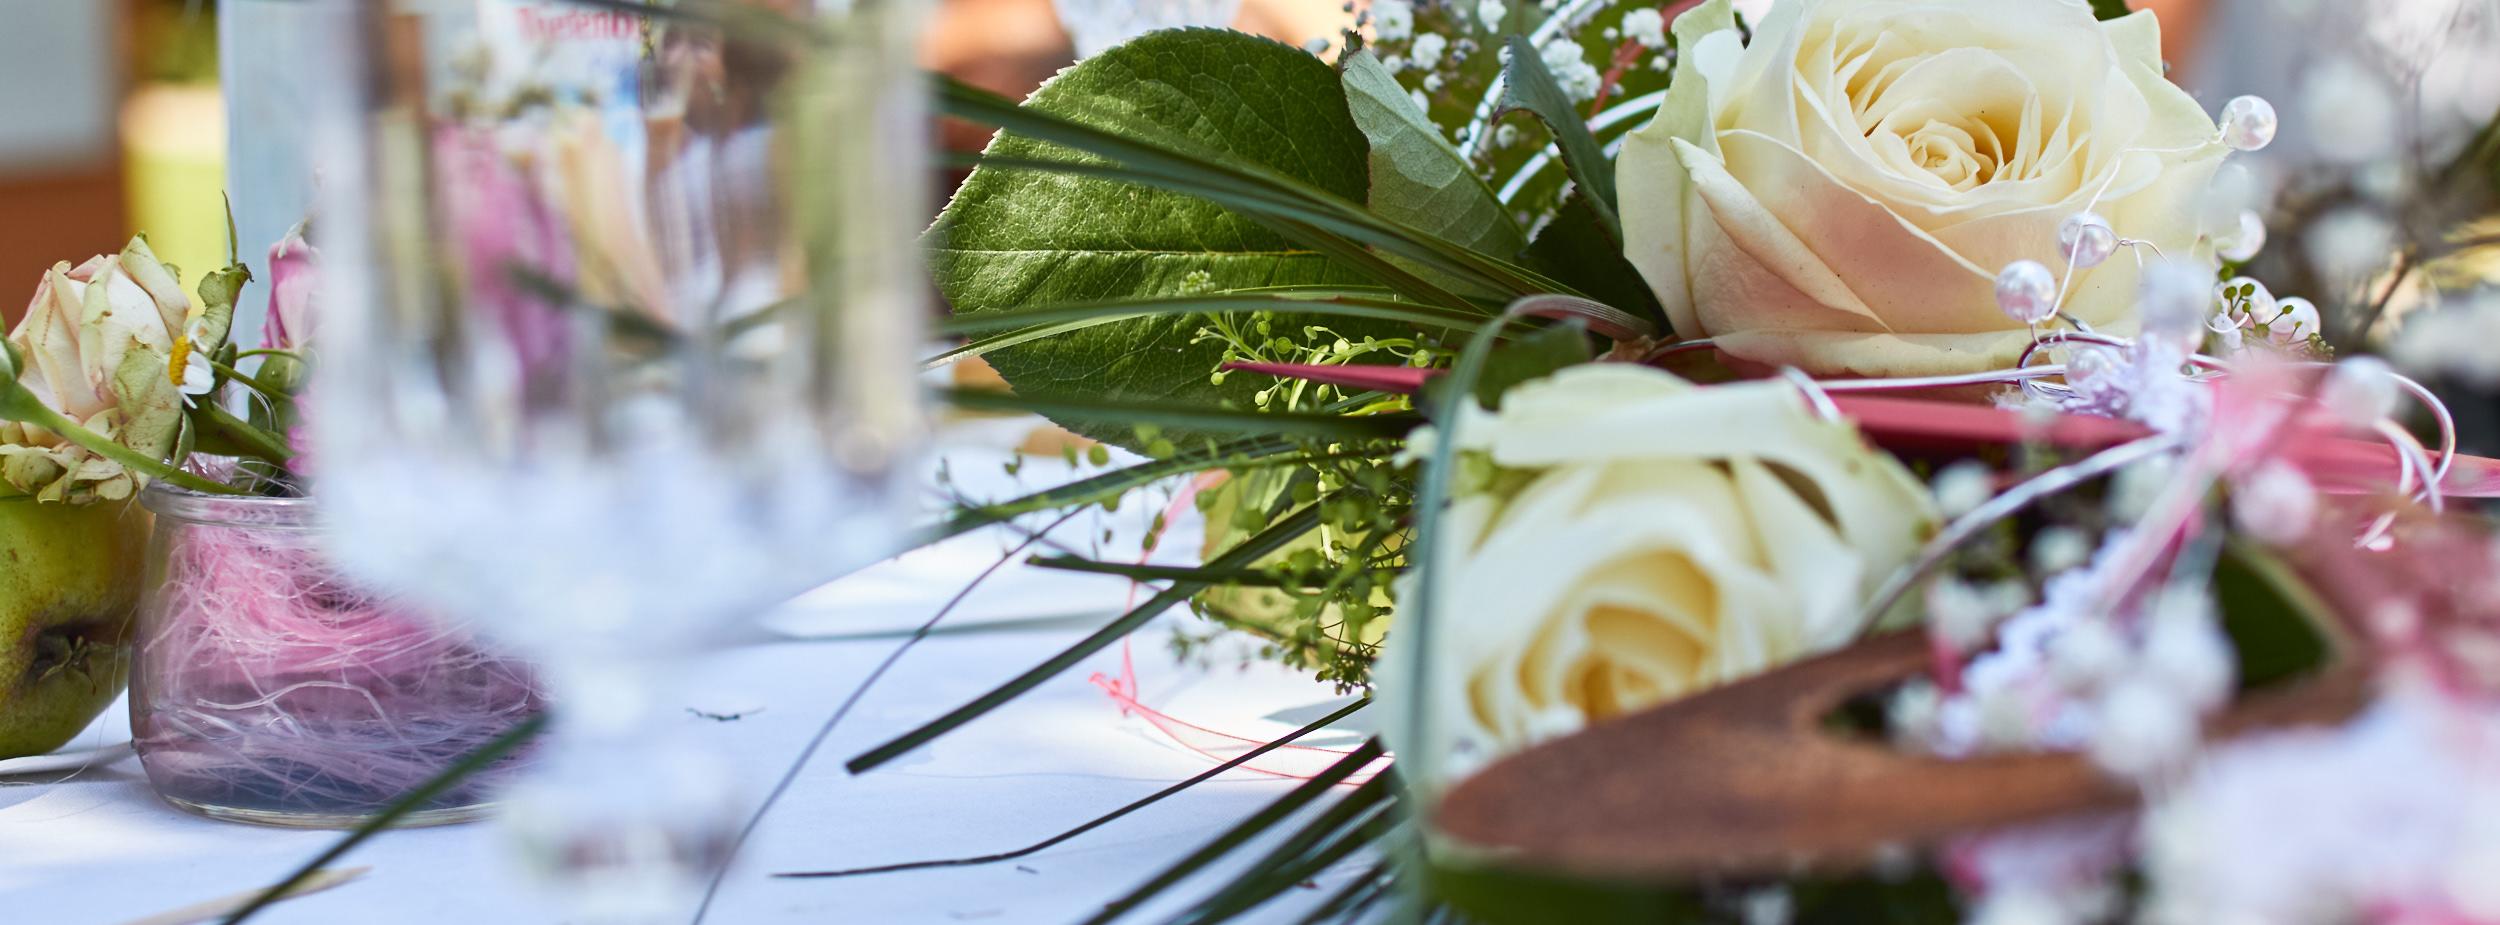 35 mm - 2018-07-27 13.46.04 - Hochzeit Andrea & Jochen Sektempfang.jpg